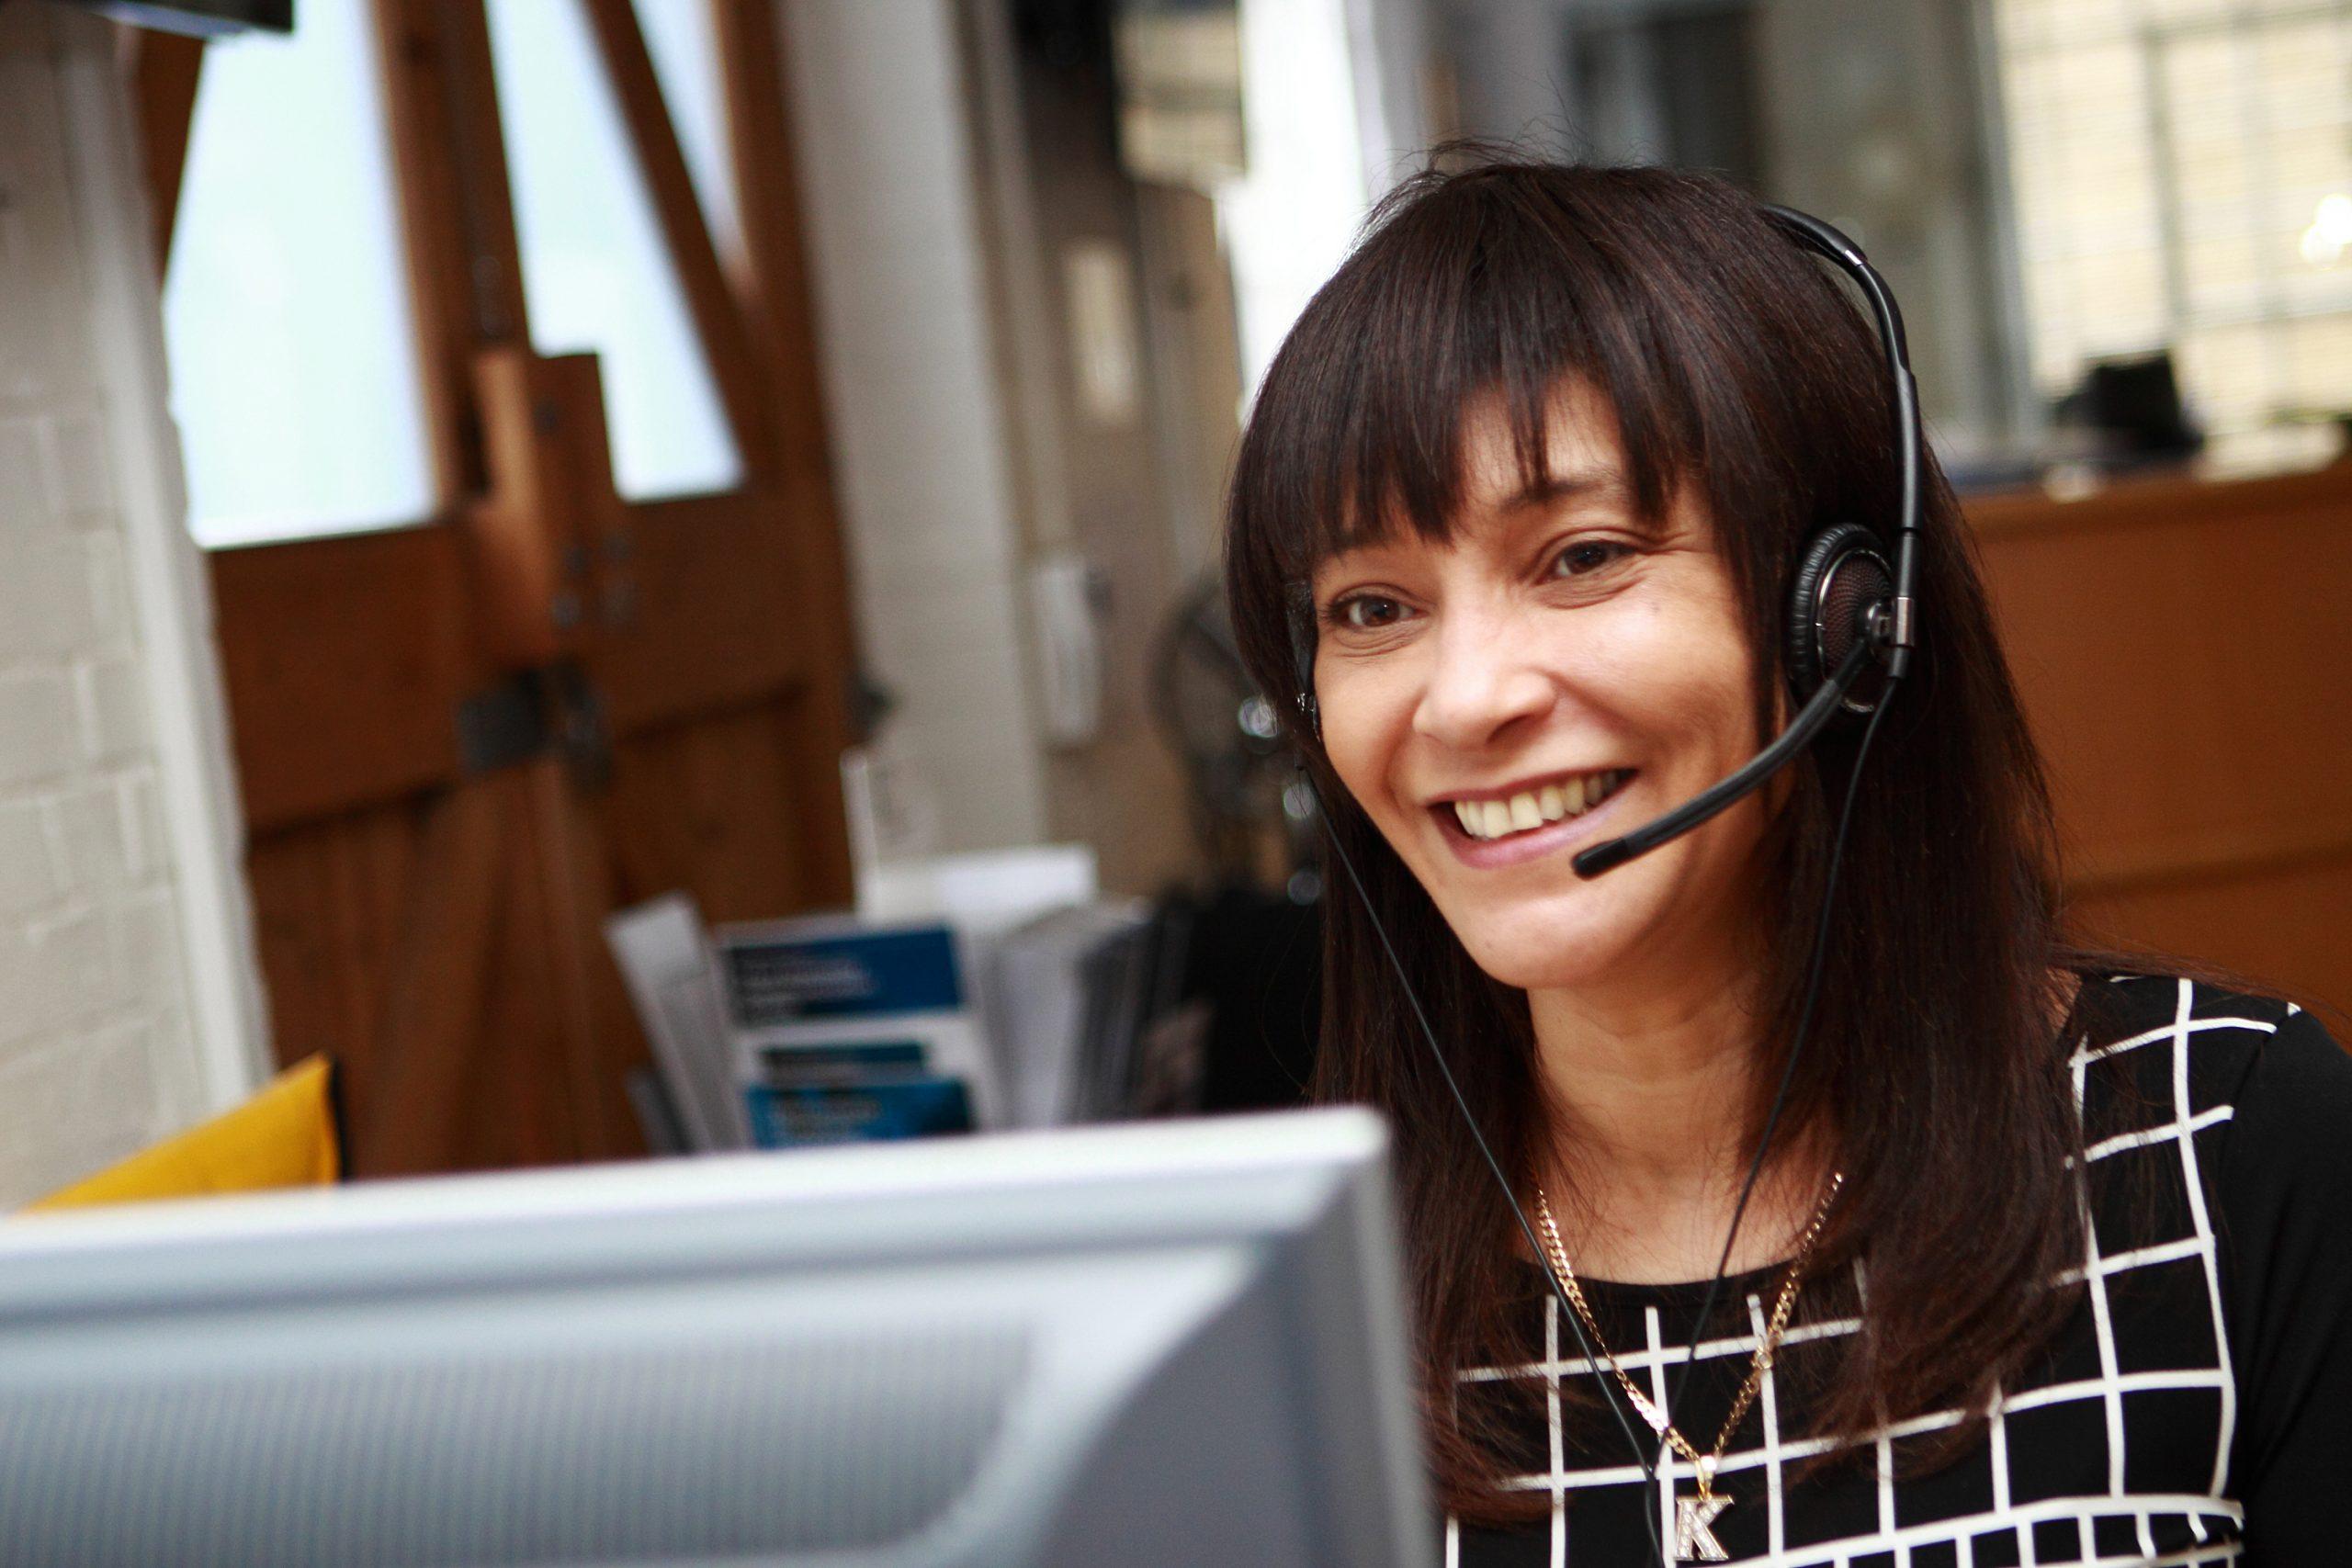 Image of woman using headset